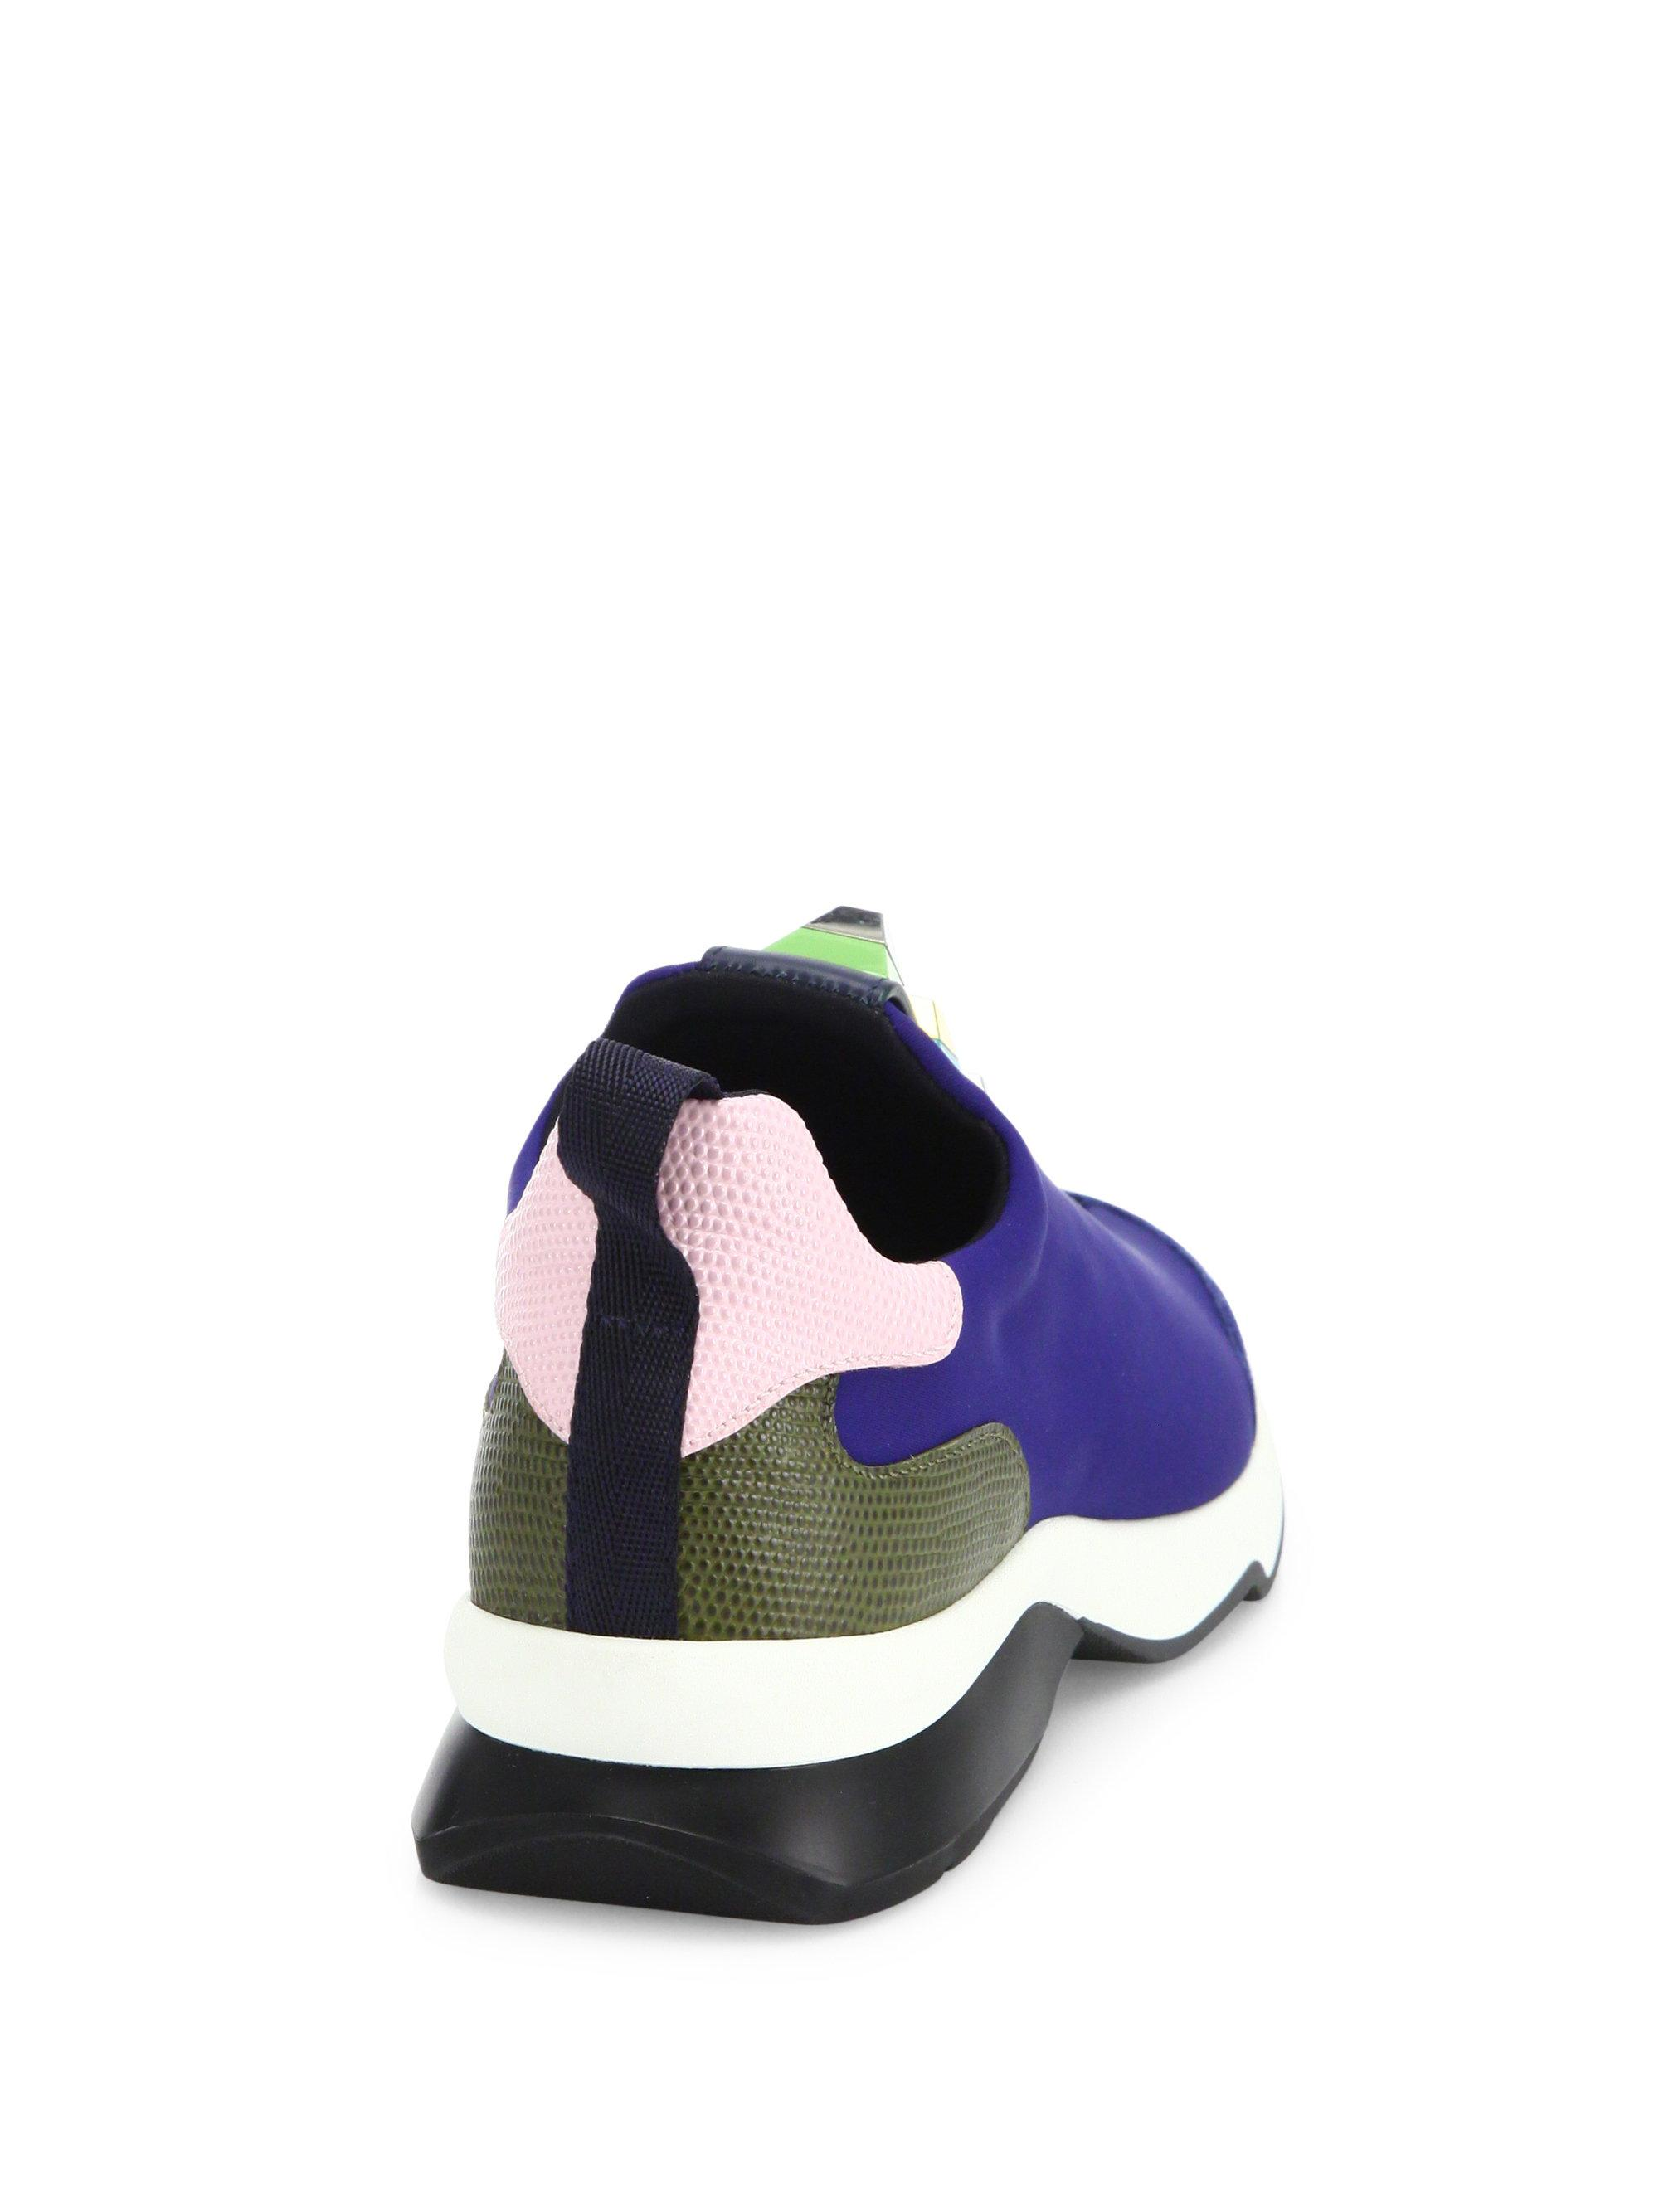 37d5518a3963 Lyst - Fendi Rainbow Studded Sneakers in Blue